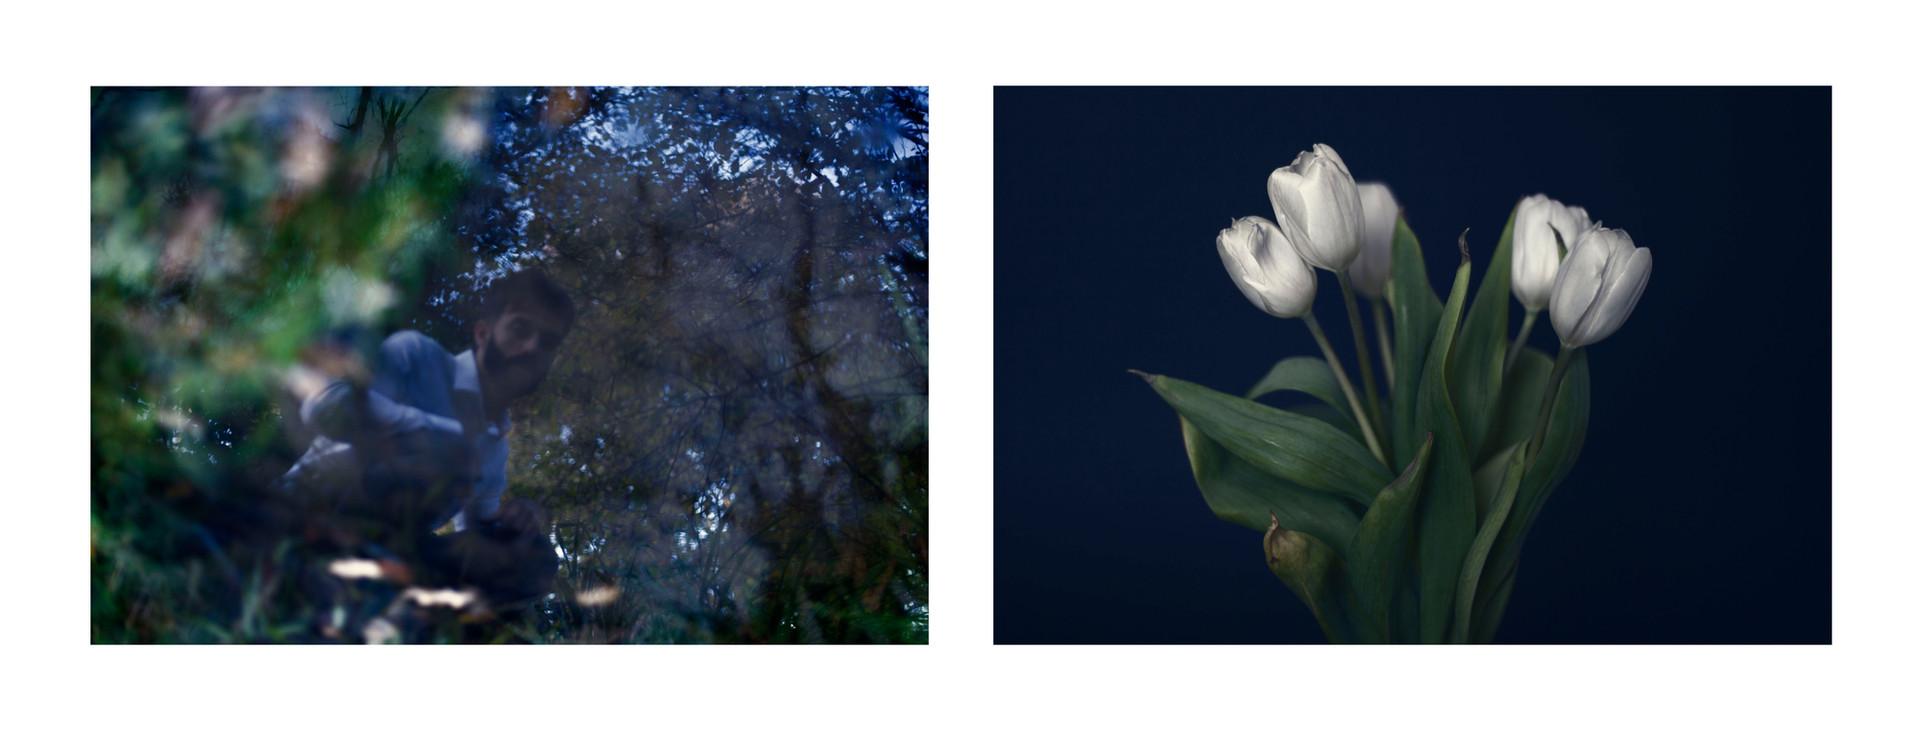 Morpheus - Both hidden and openly